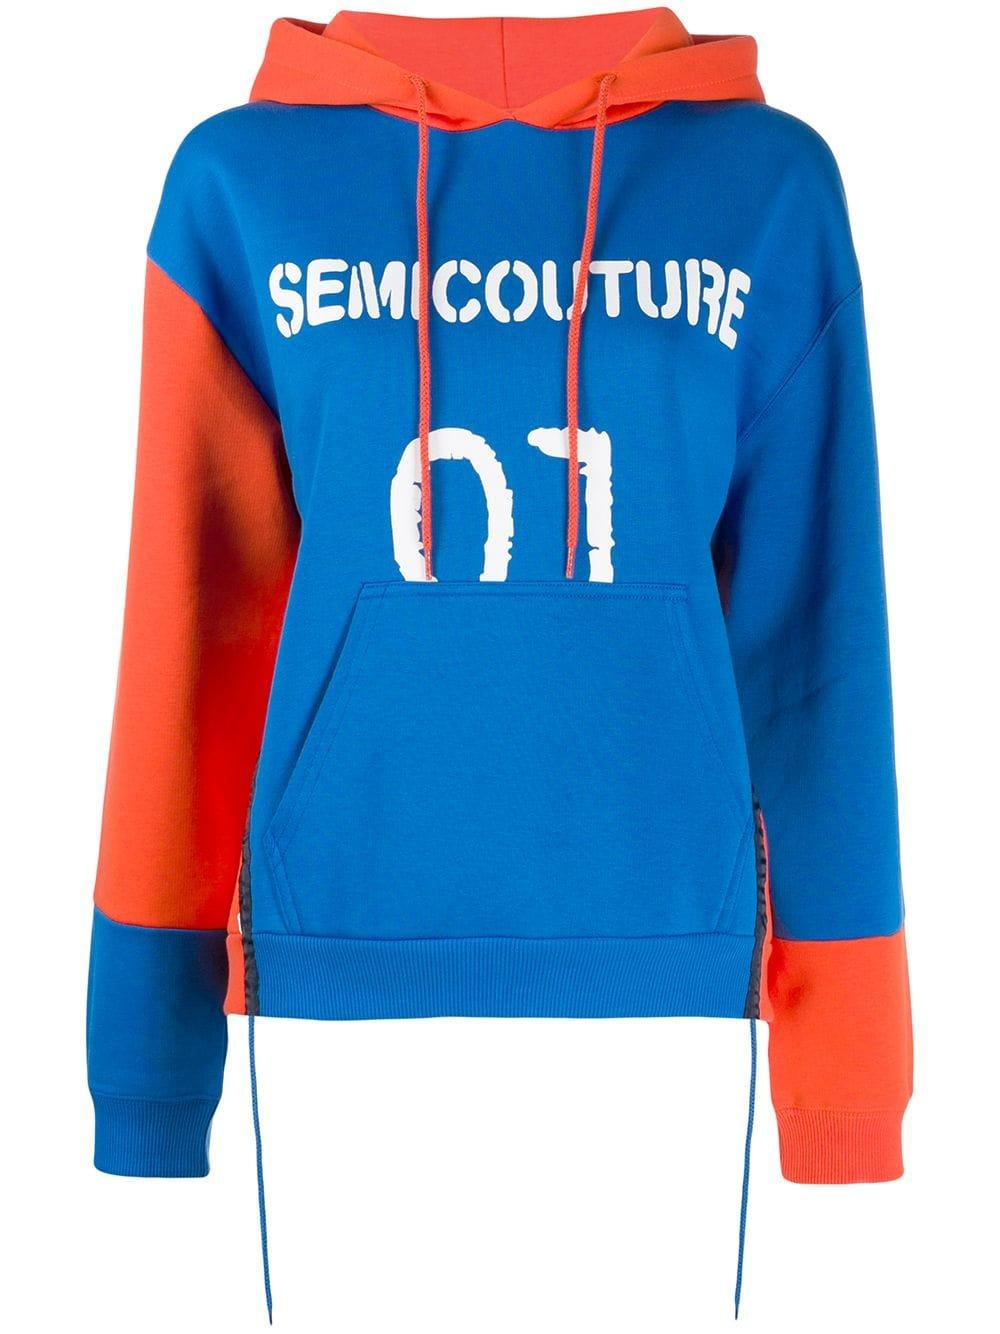 Blue Semicouture Logo Print Hoodie | Farfetch.com